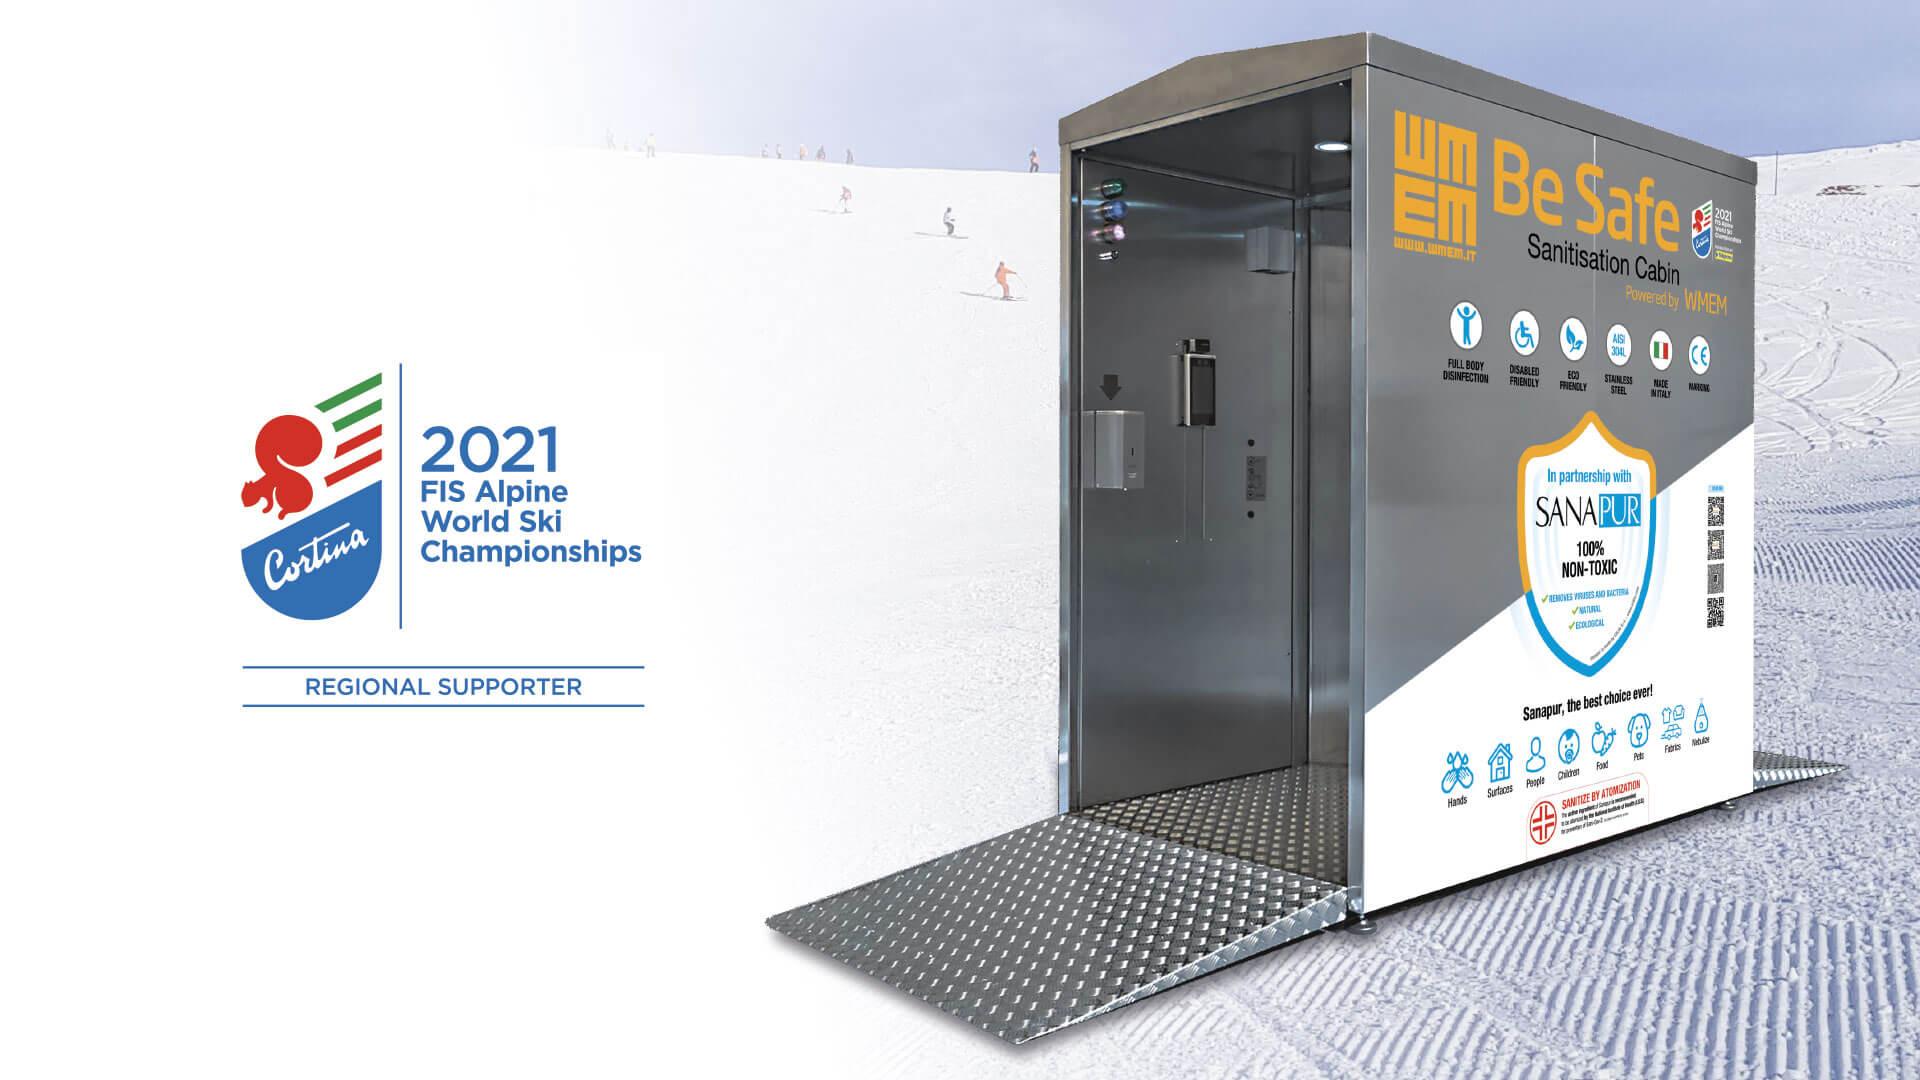 sanitation-disinfection-cabin-sanapur-besafe-world-supplier-ski-cortina-S2Life